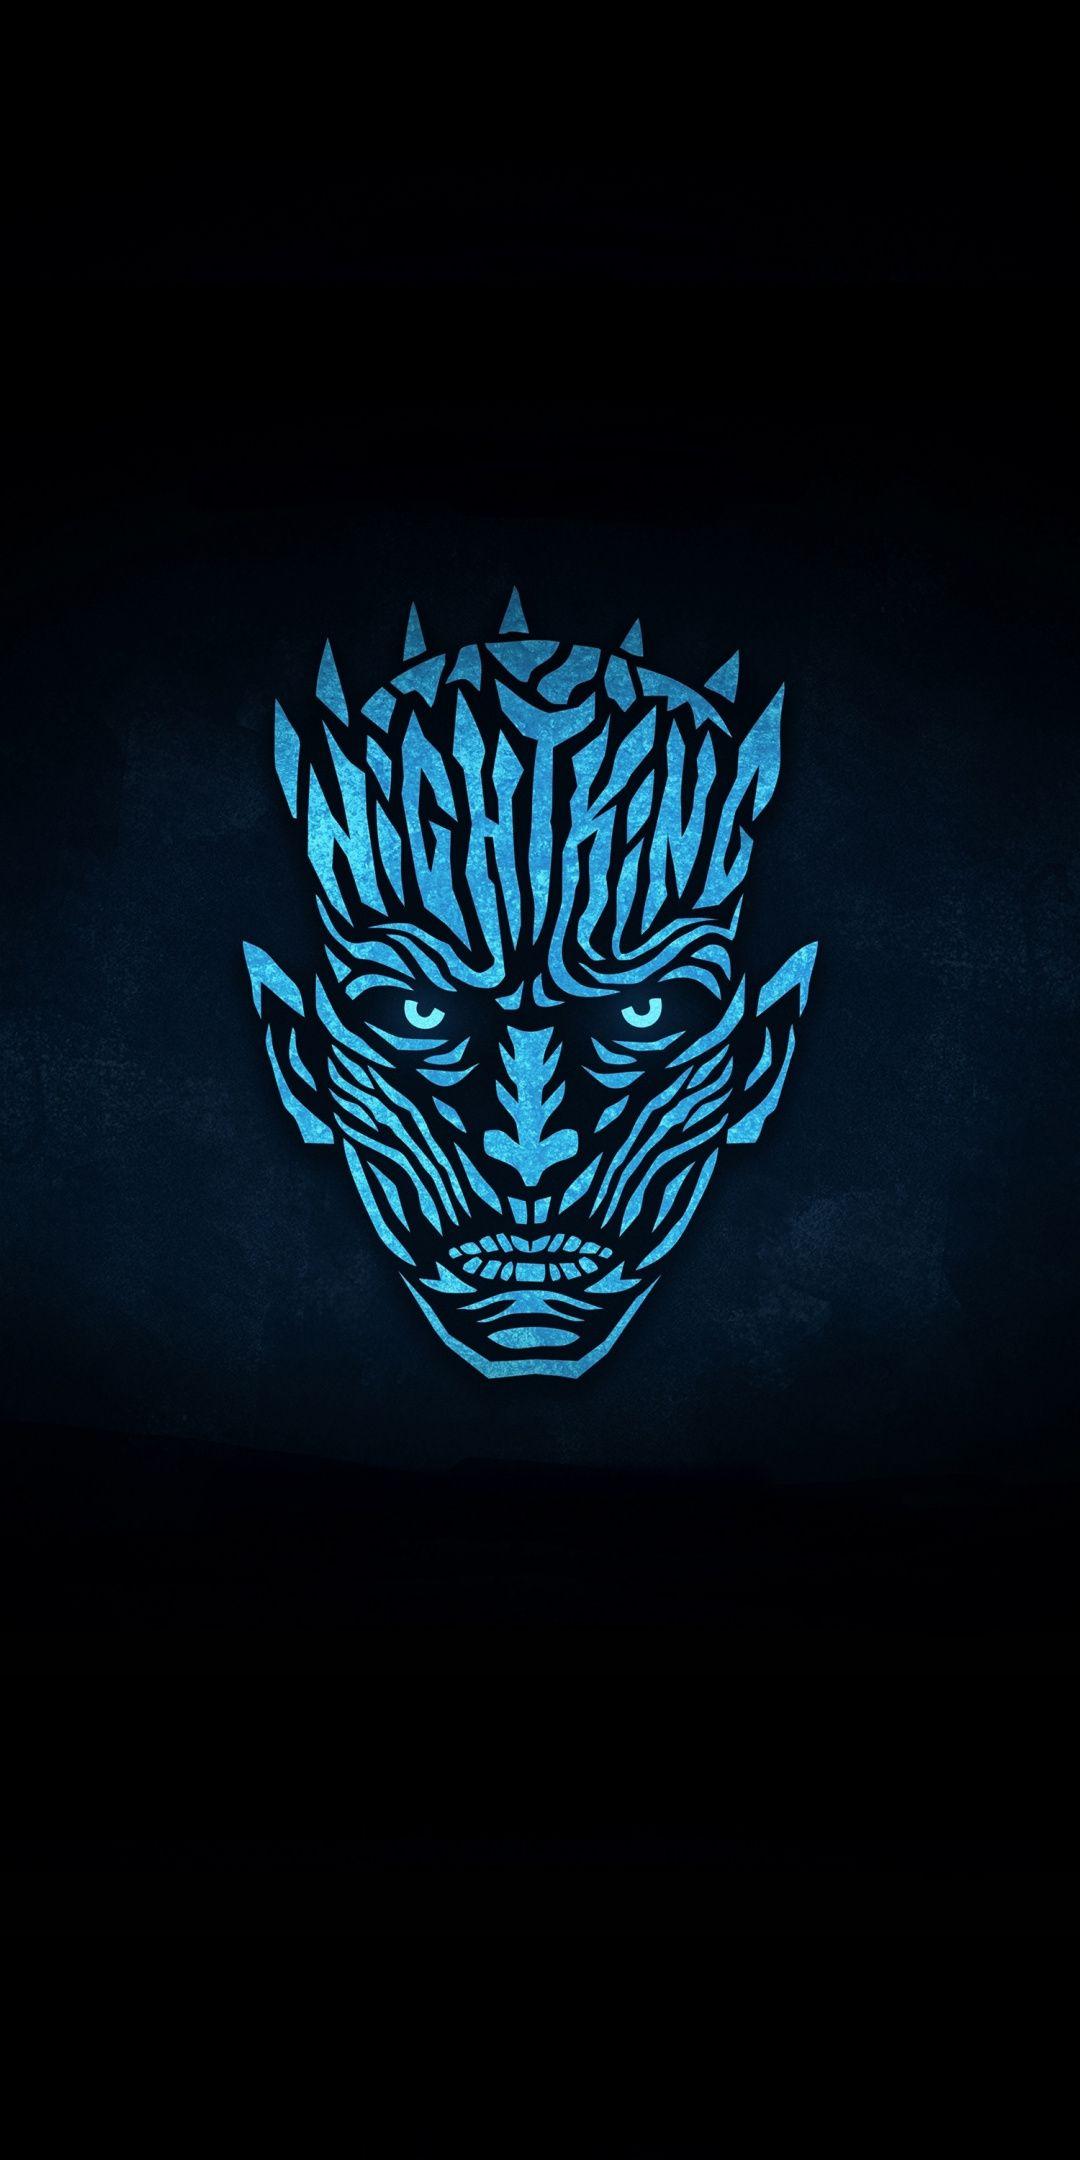 Night King Artwork Minimal Got 1080x2160 Wallpaper Night King Game Of Thrones Art Game Of Thrones Poster